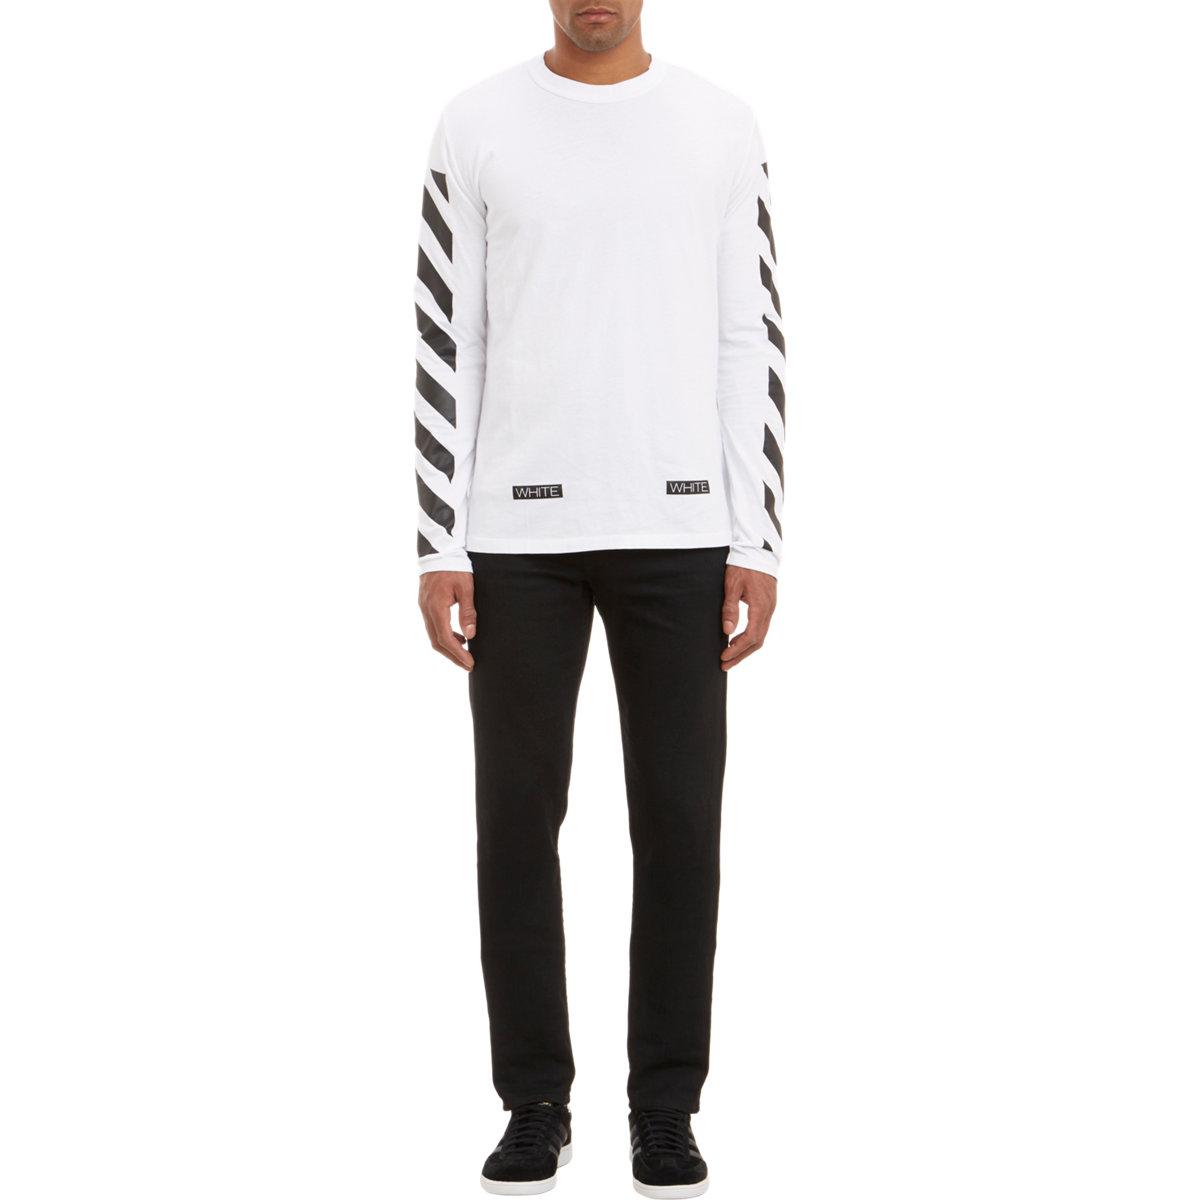 afae93f69 Off-White c/o Virgil Abloh Diagonal-Stripe Long-Sleeve T-Shirt in ...